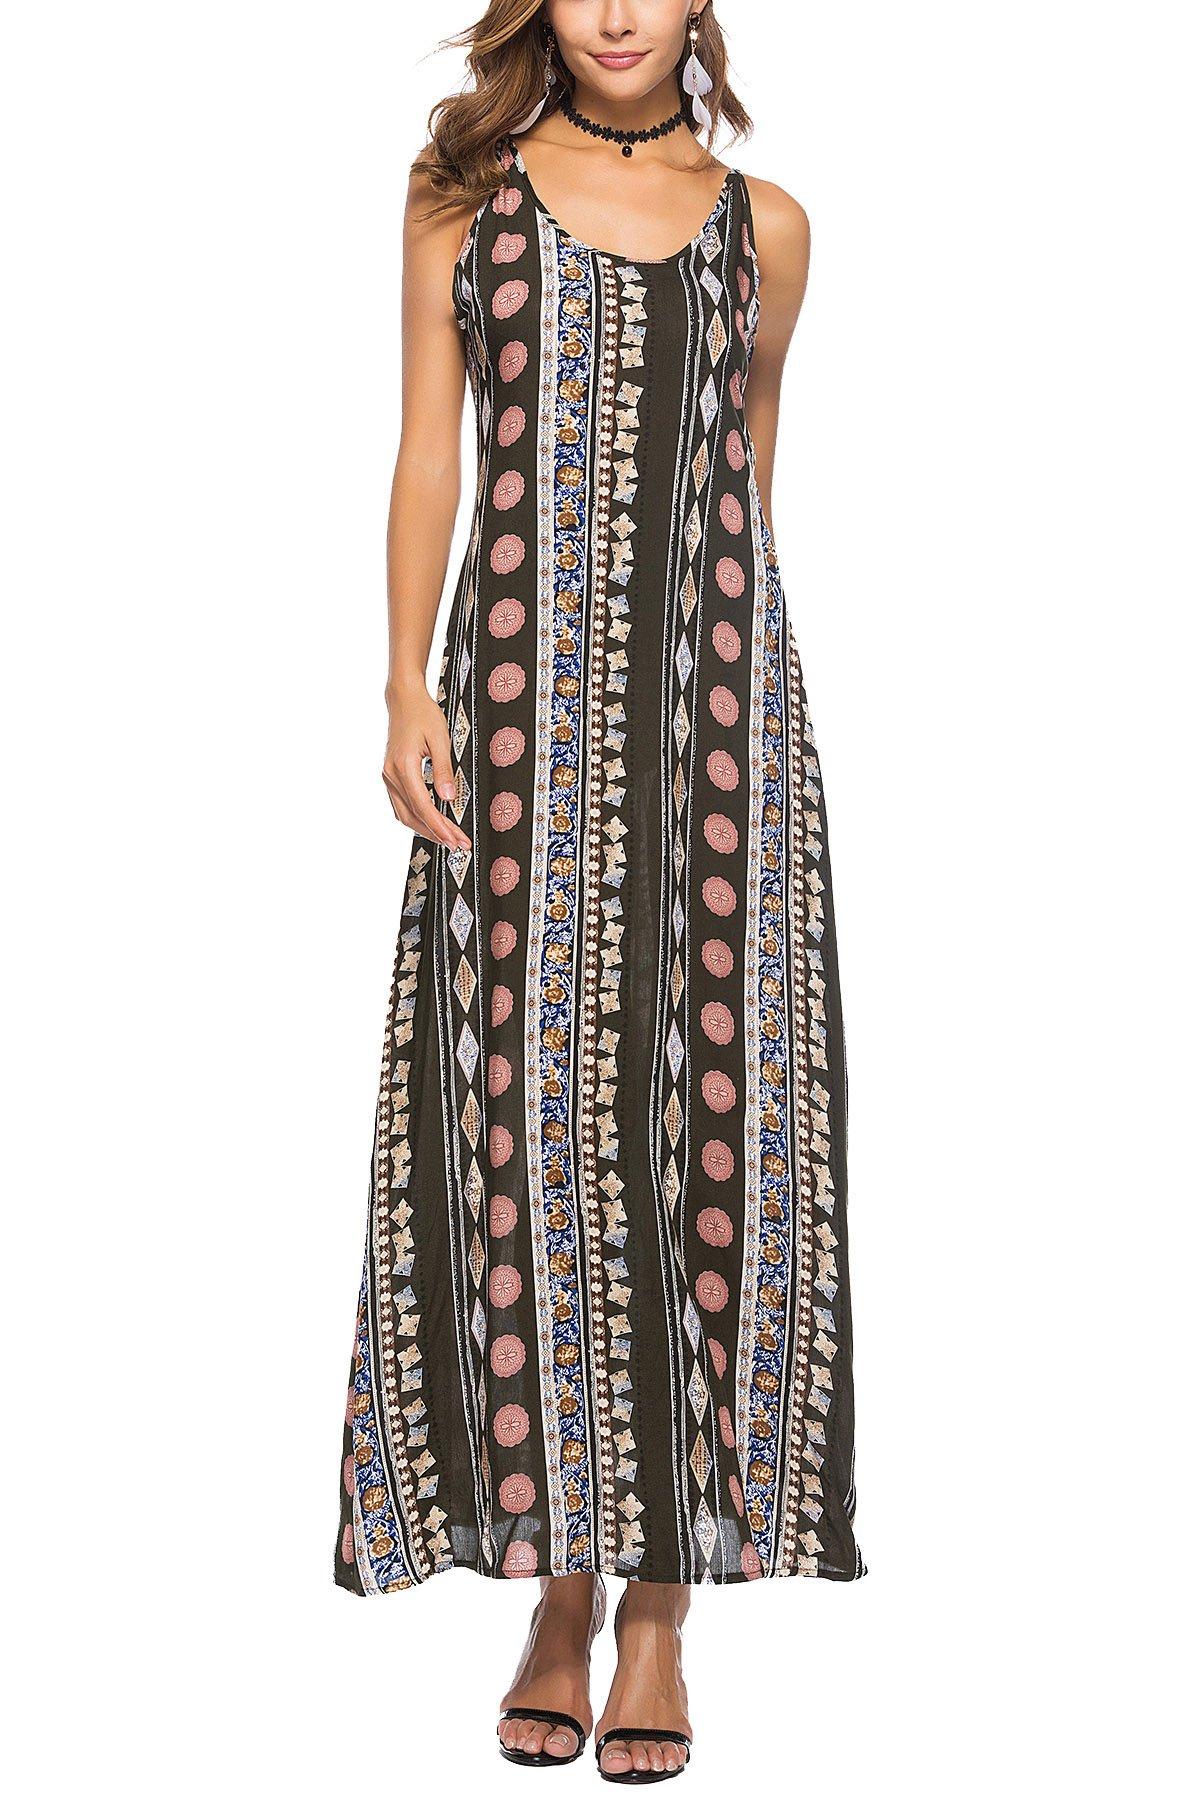 JYUAN Women's Casual Summer Backless Floral Print Summer Spaghetti Straps Boho Beach Long Maxi Dress